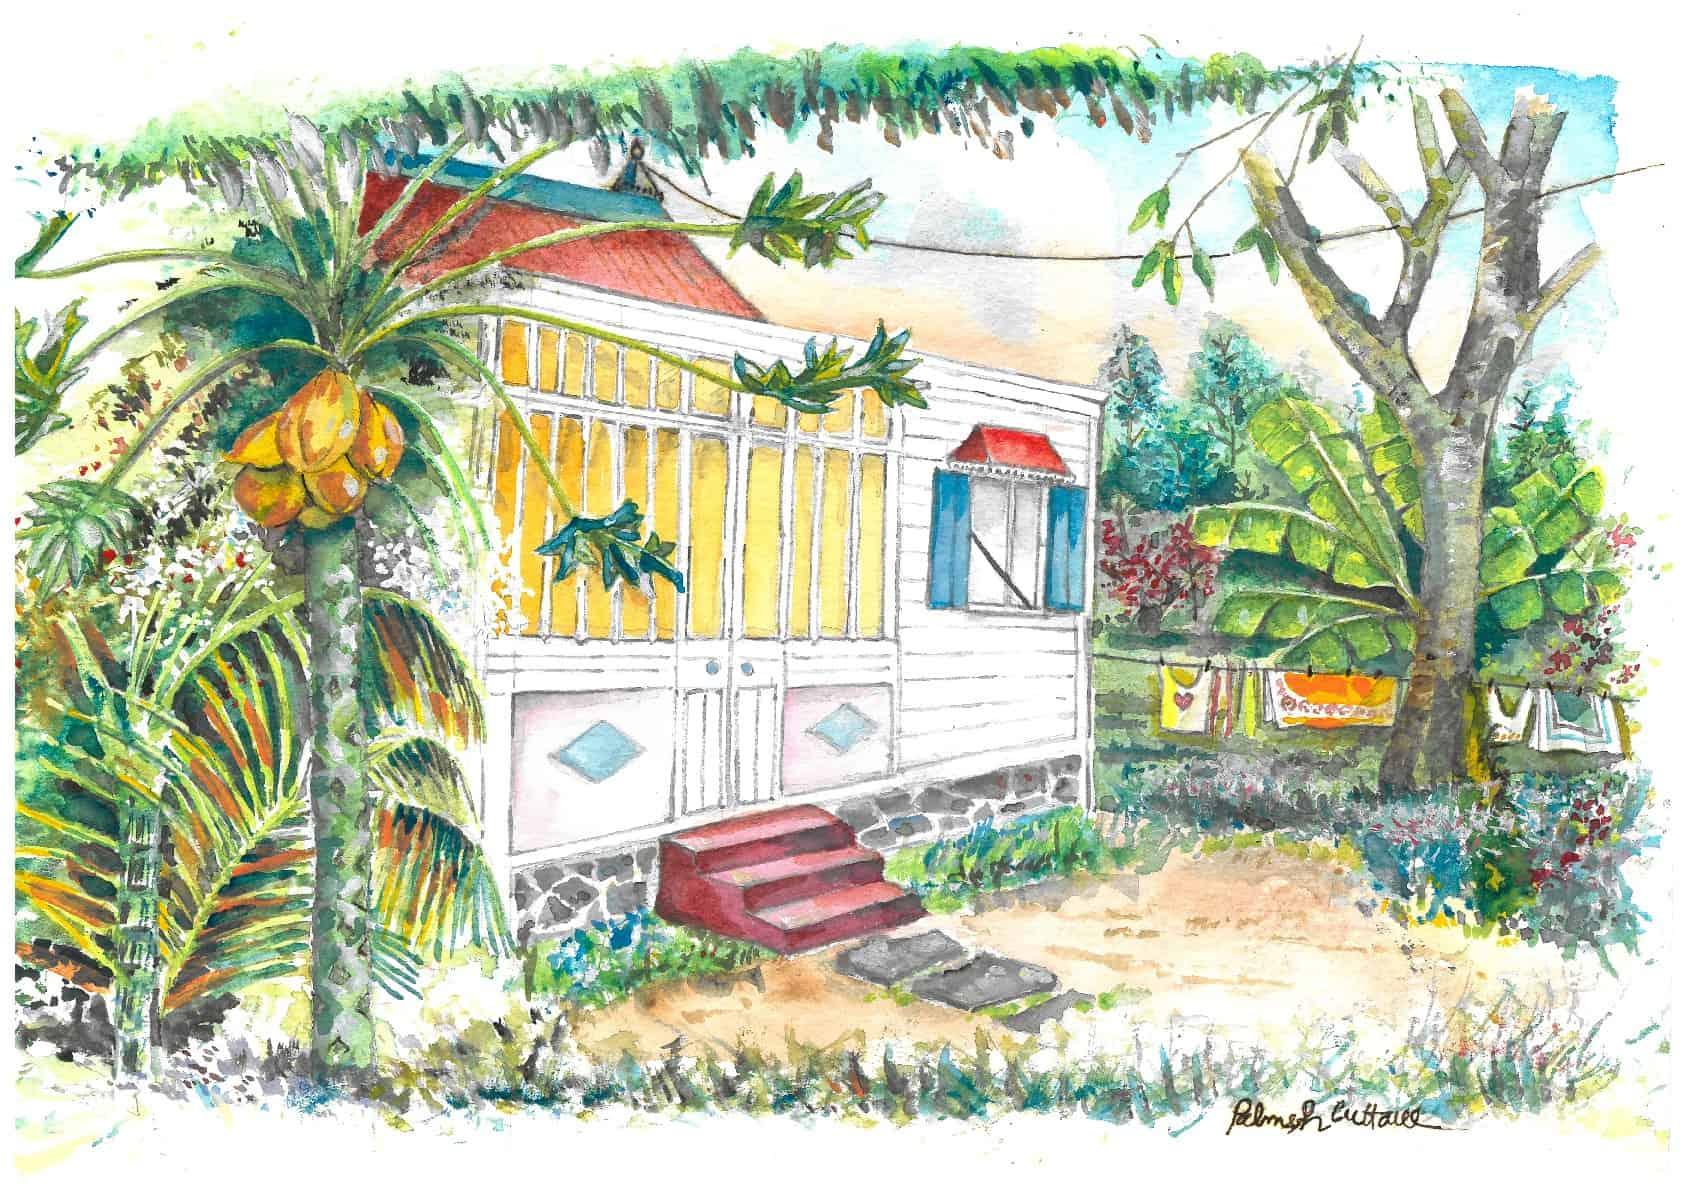 souvenir-palmesh-cuttaree-maison-creole-coloree